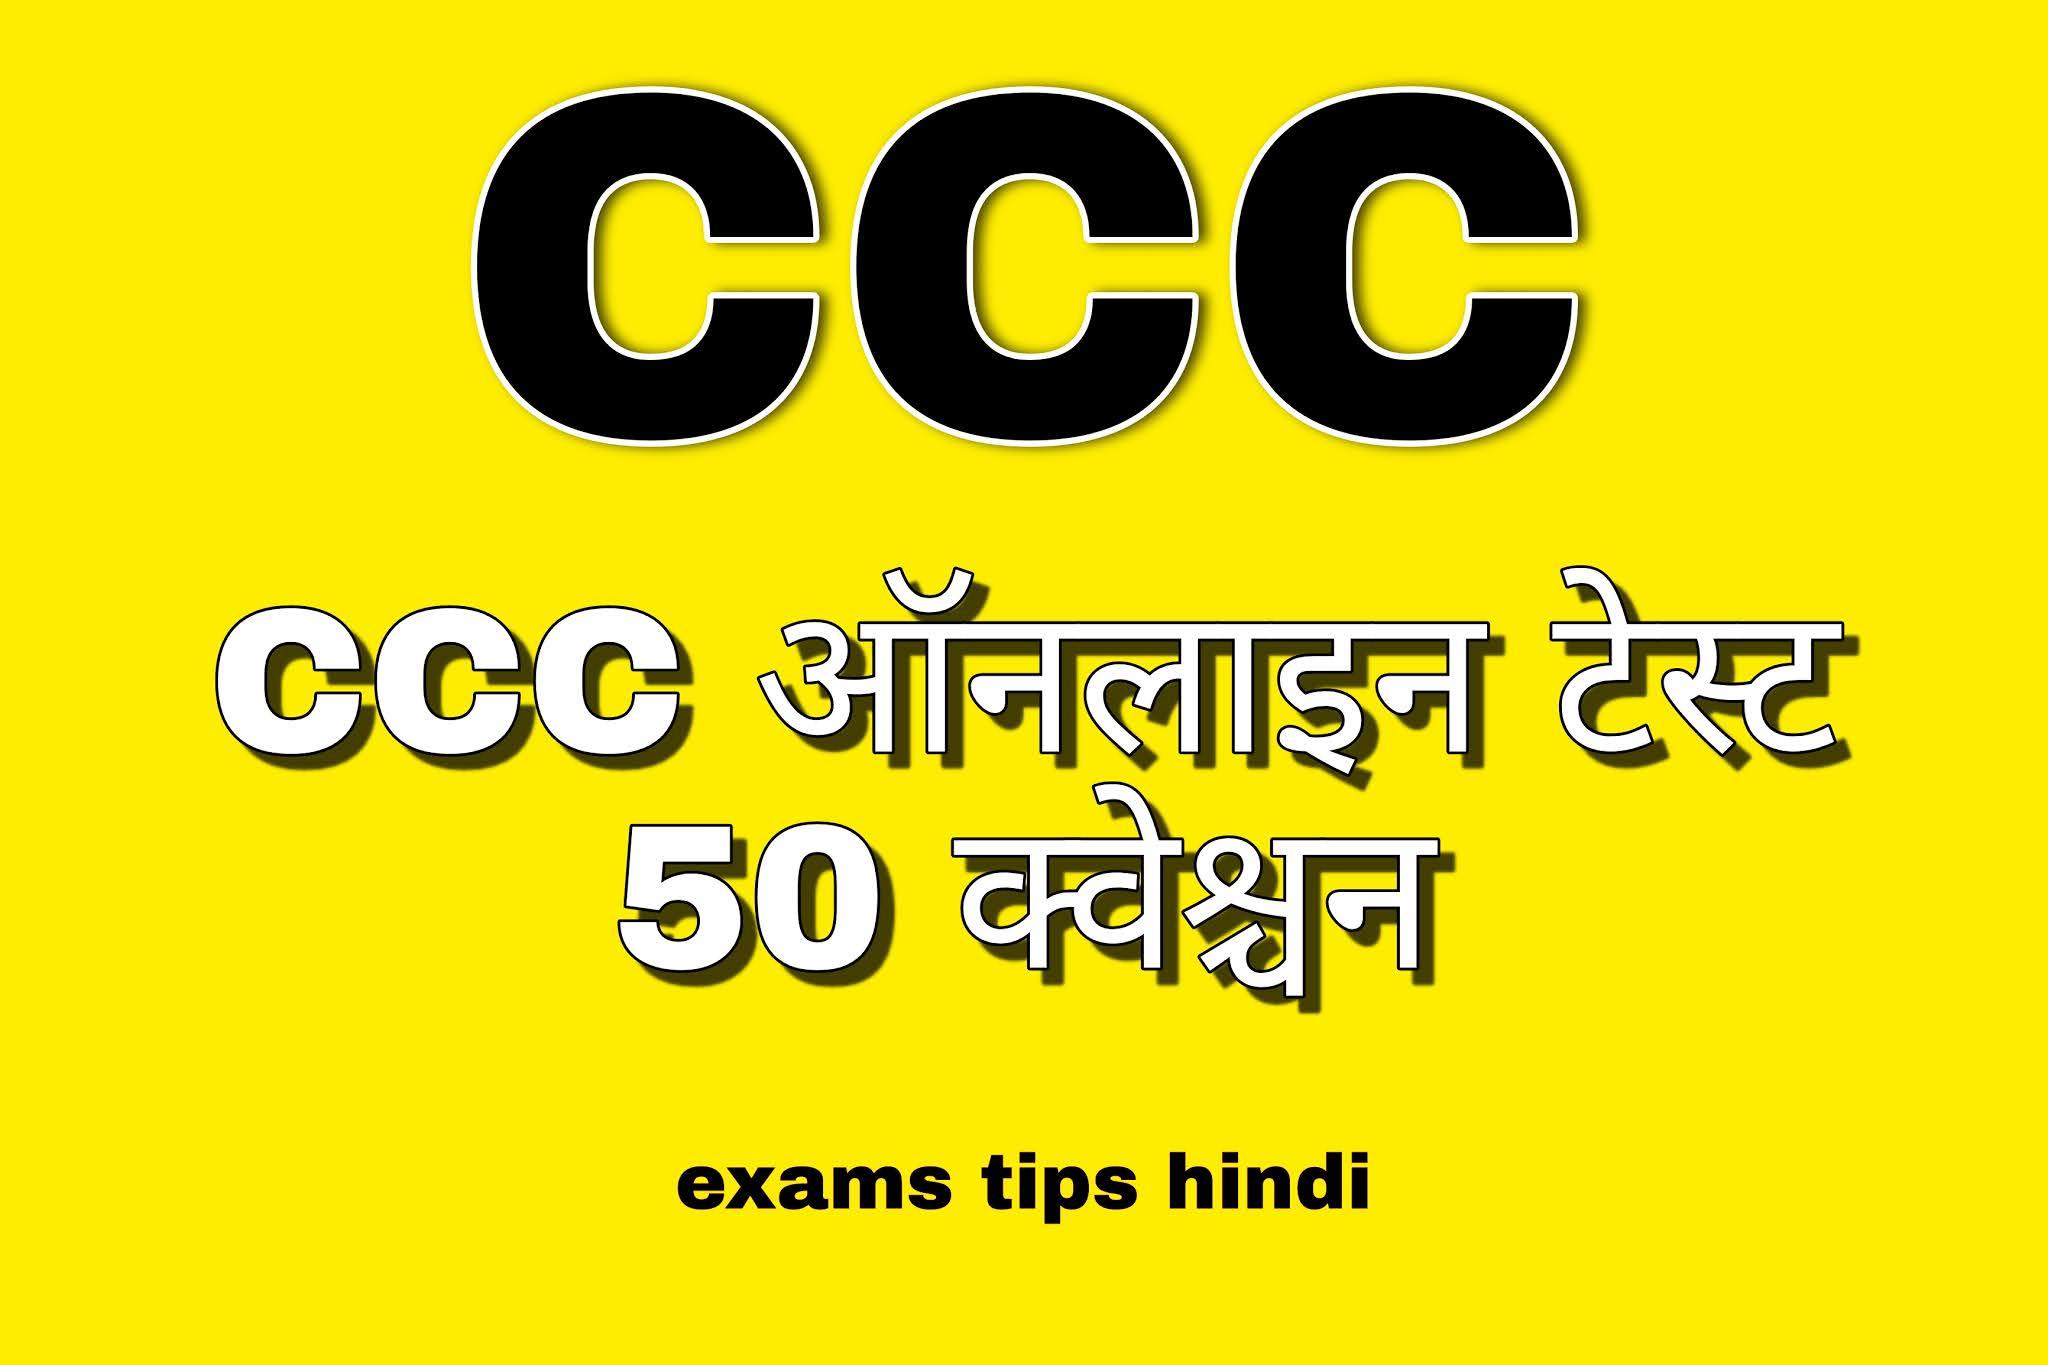 CCC ऑनलाइन टेस्ट